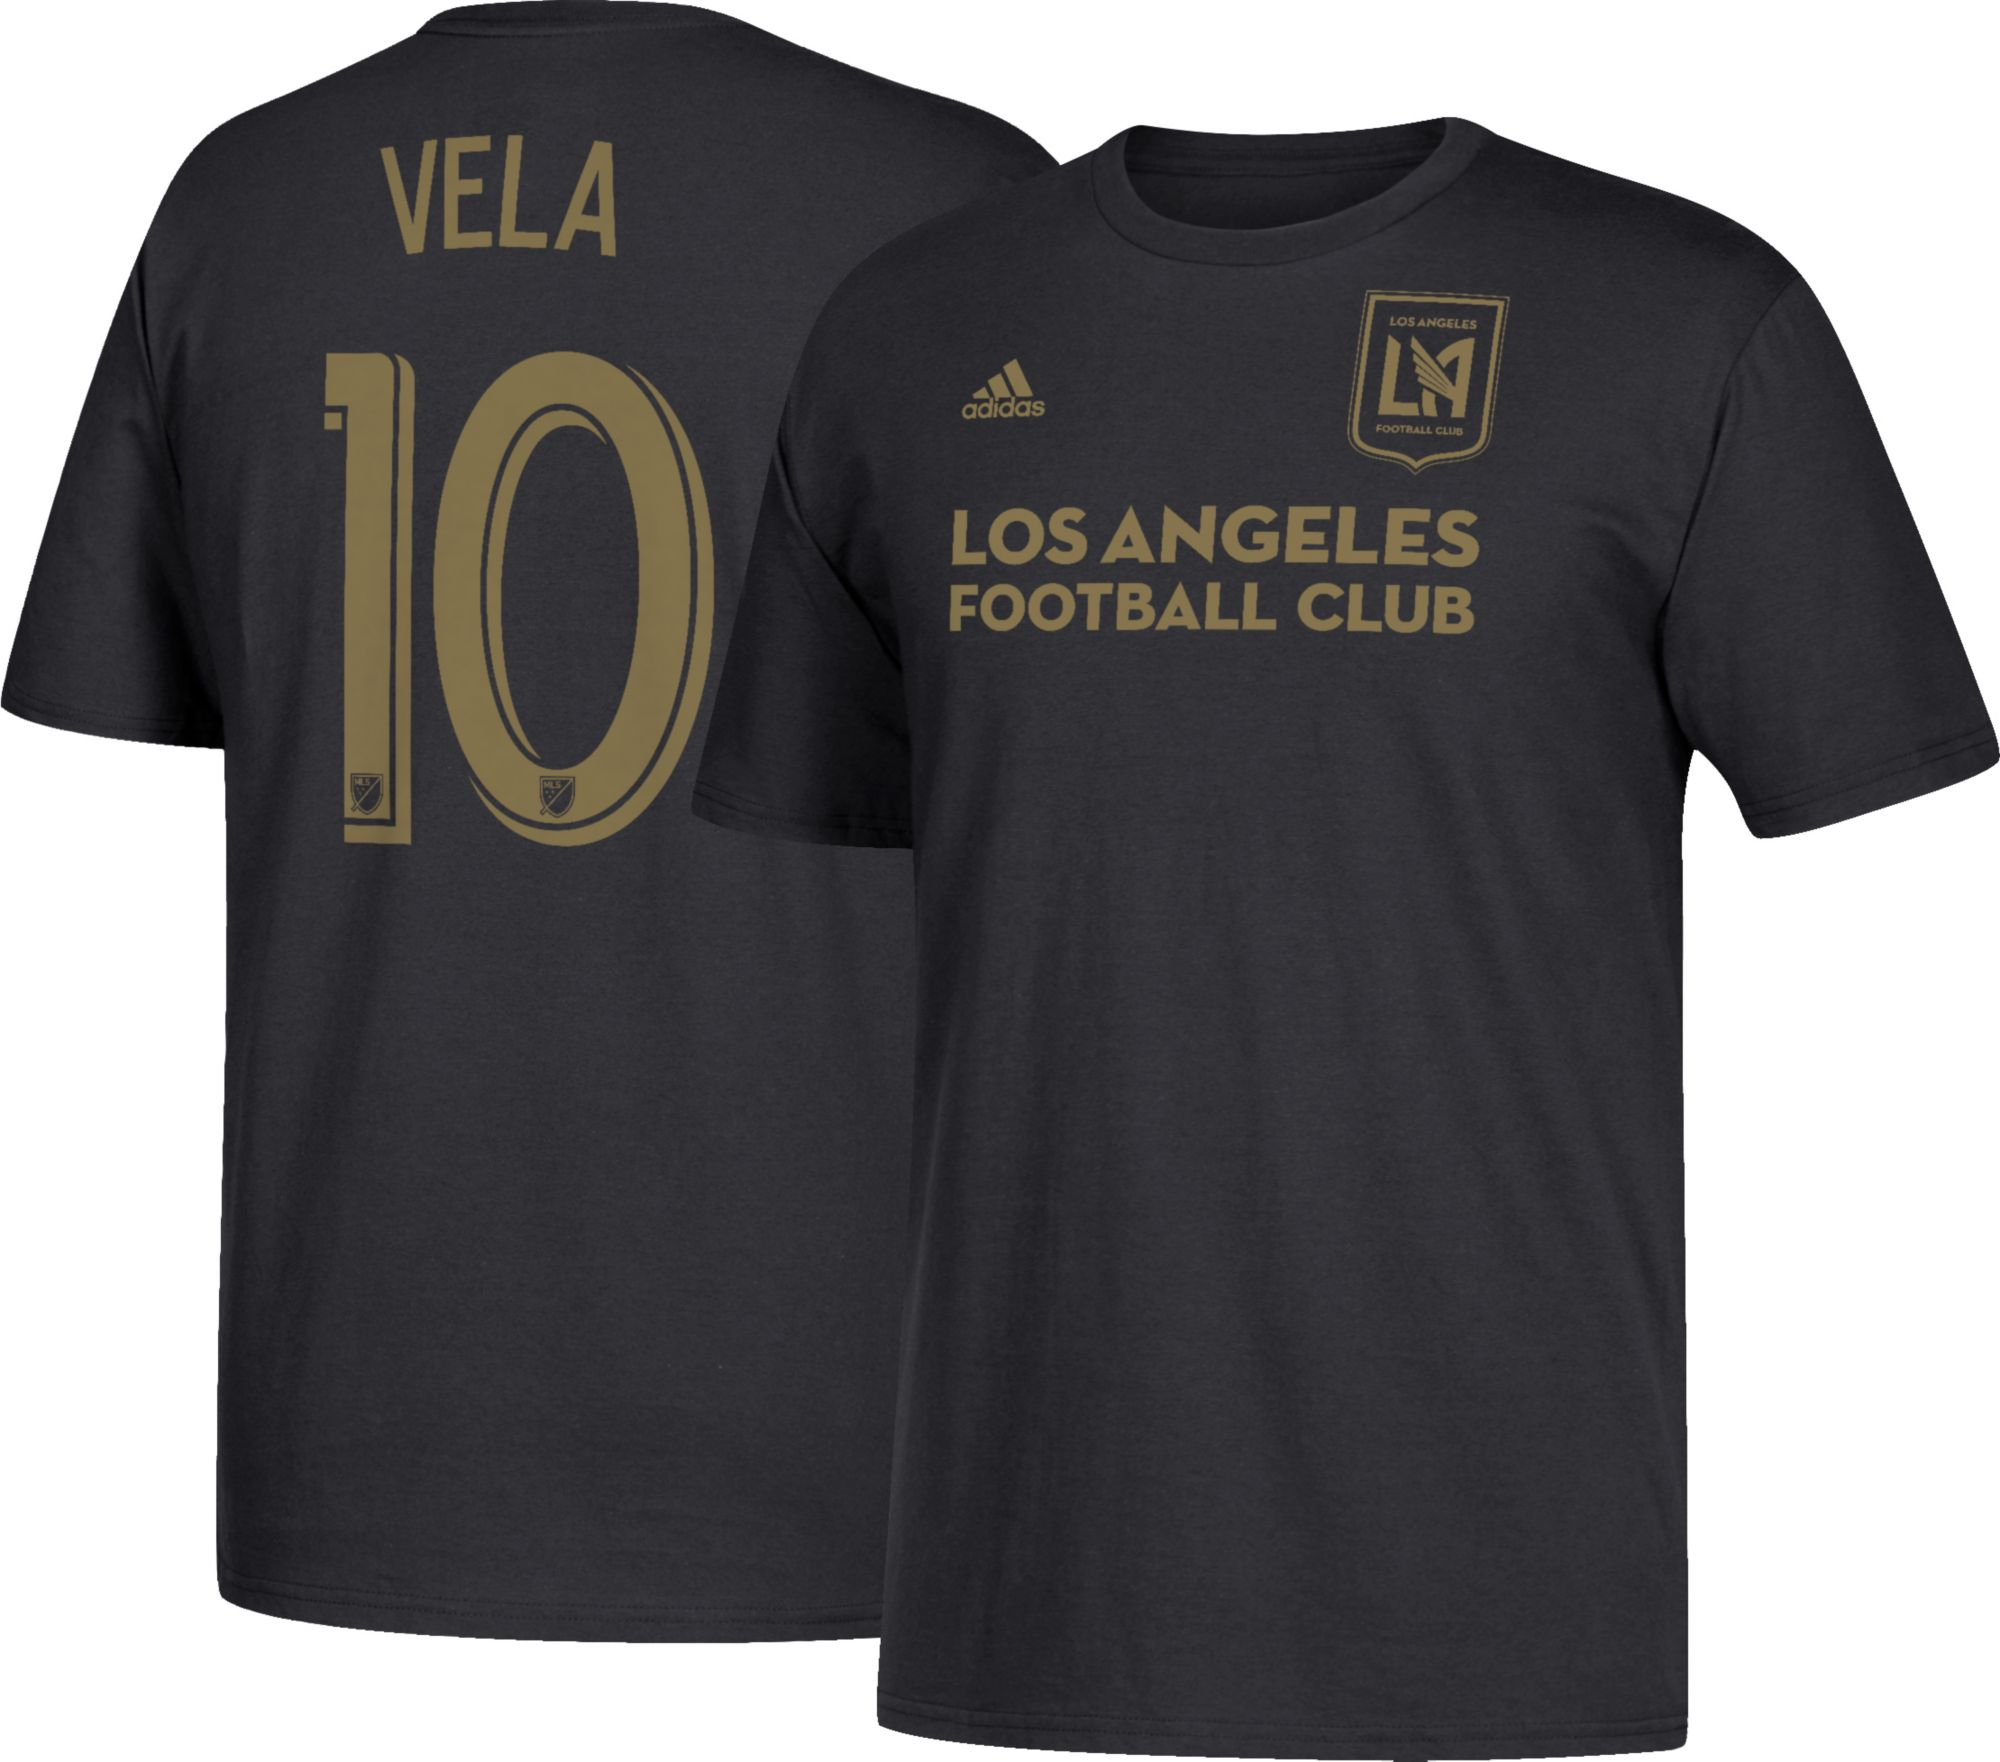 Adidas uomini di los angeles e carlos vela 10 nero t - shirt dick